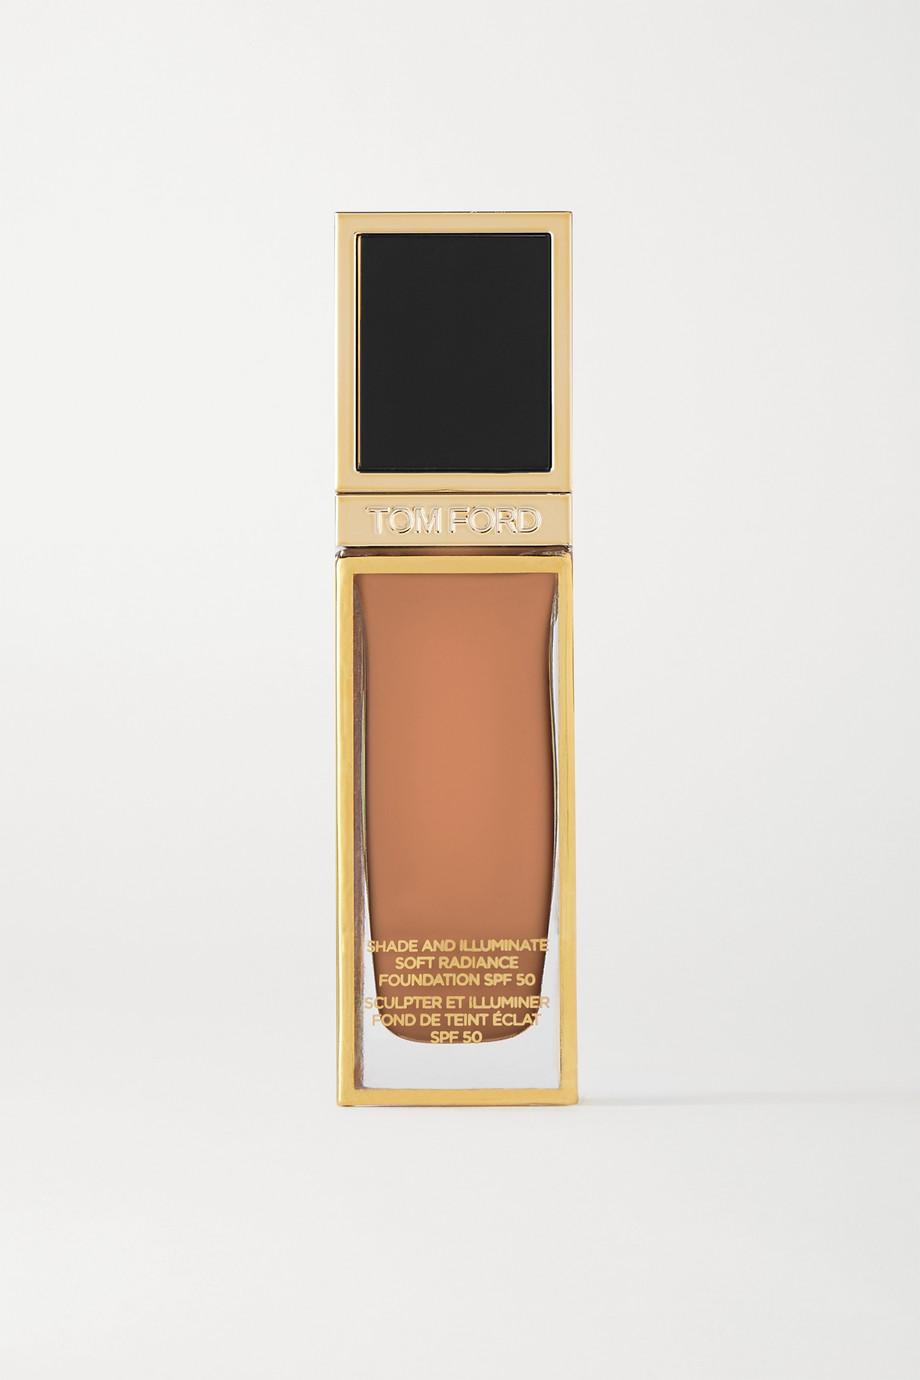 TOM FORD BEAUTY Shade and Illuminate Soft Radiance Foundation SPF50 - 8.2 Warm Honey, 30ml